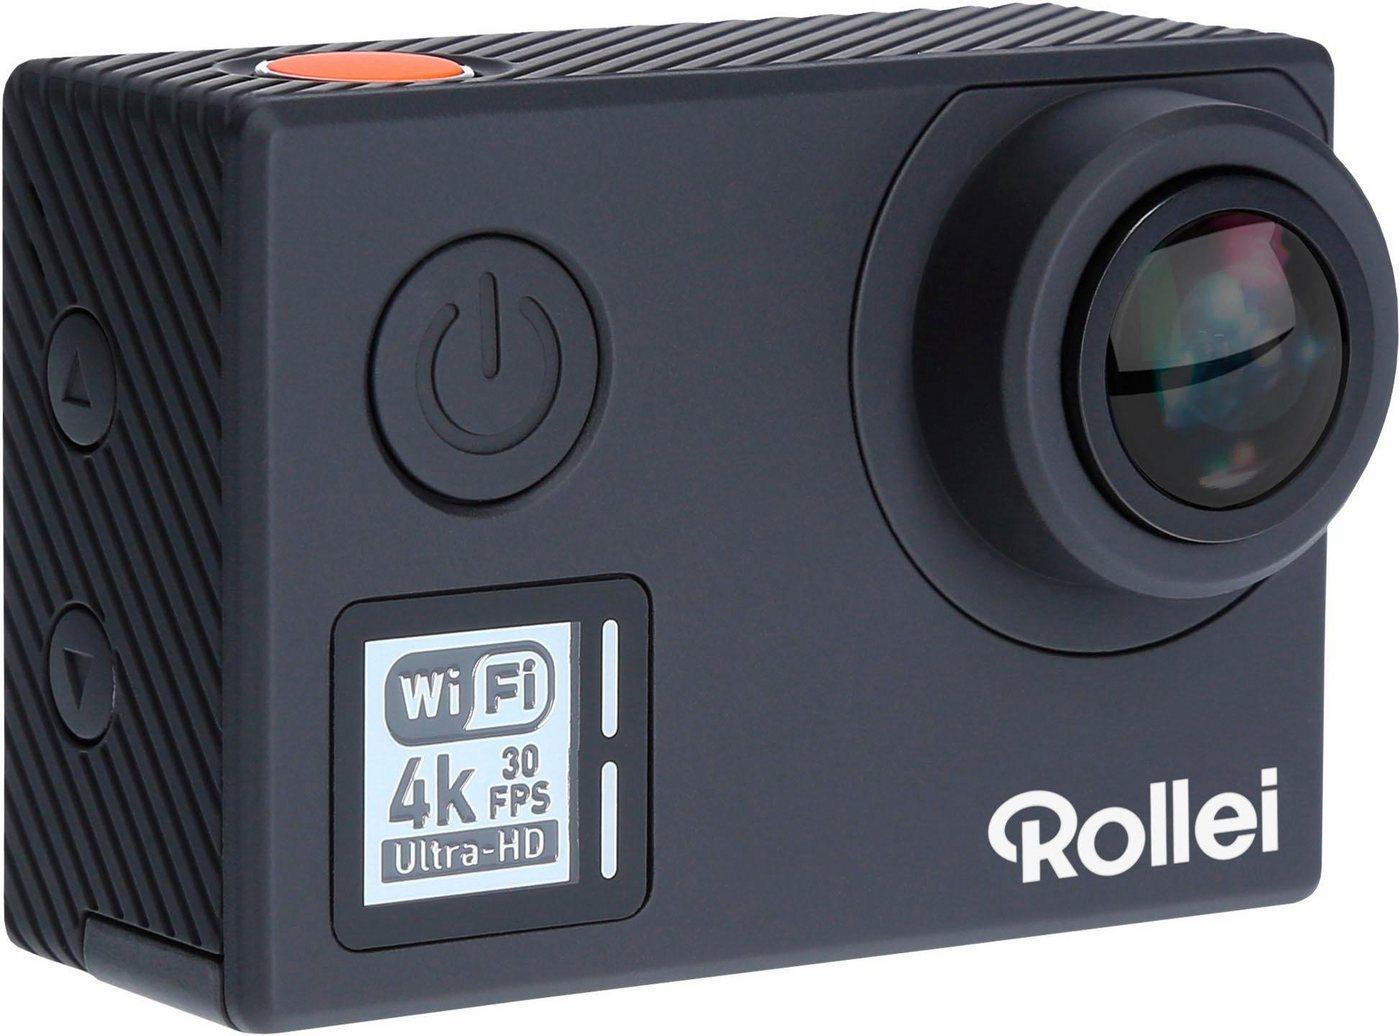 Action, Outdoorkameras - Rollei 530 4K (Ultra HD) Actioncam, WLAN, Bluetooth  - Onlineshop OTTO